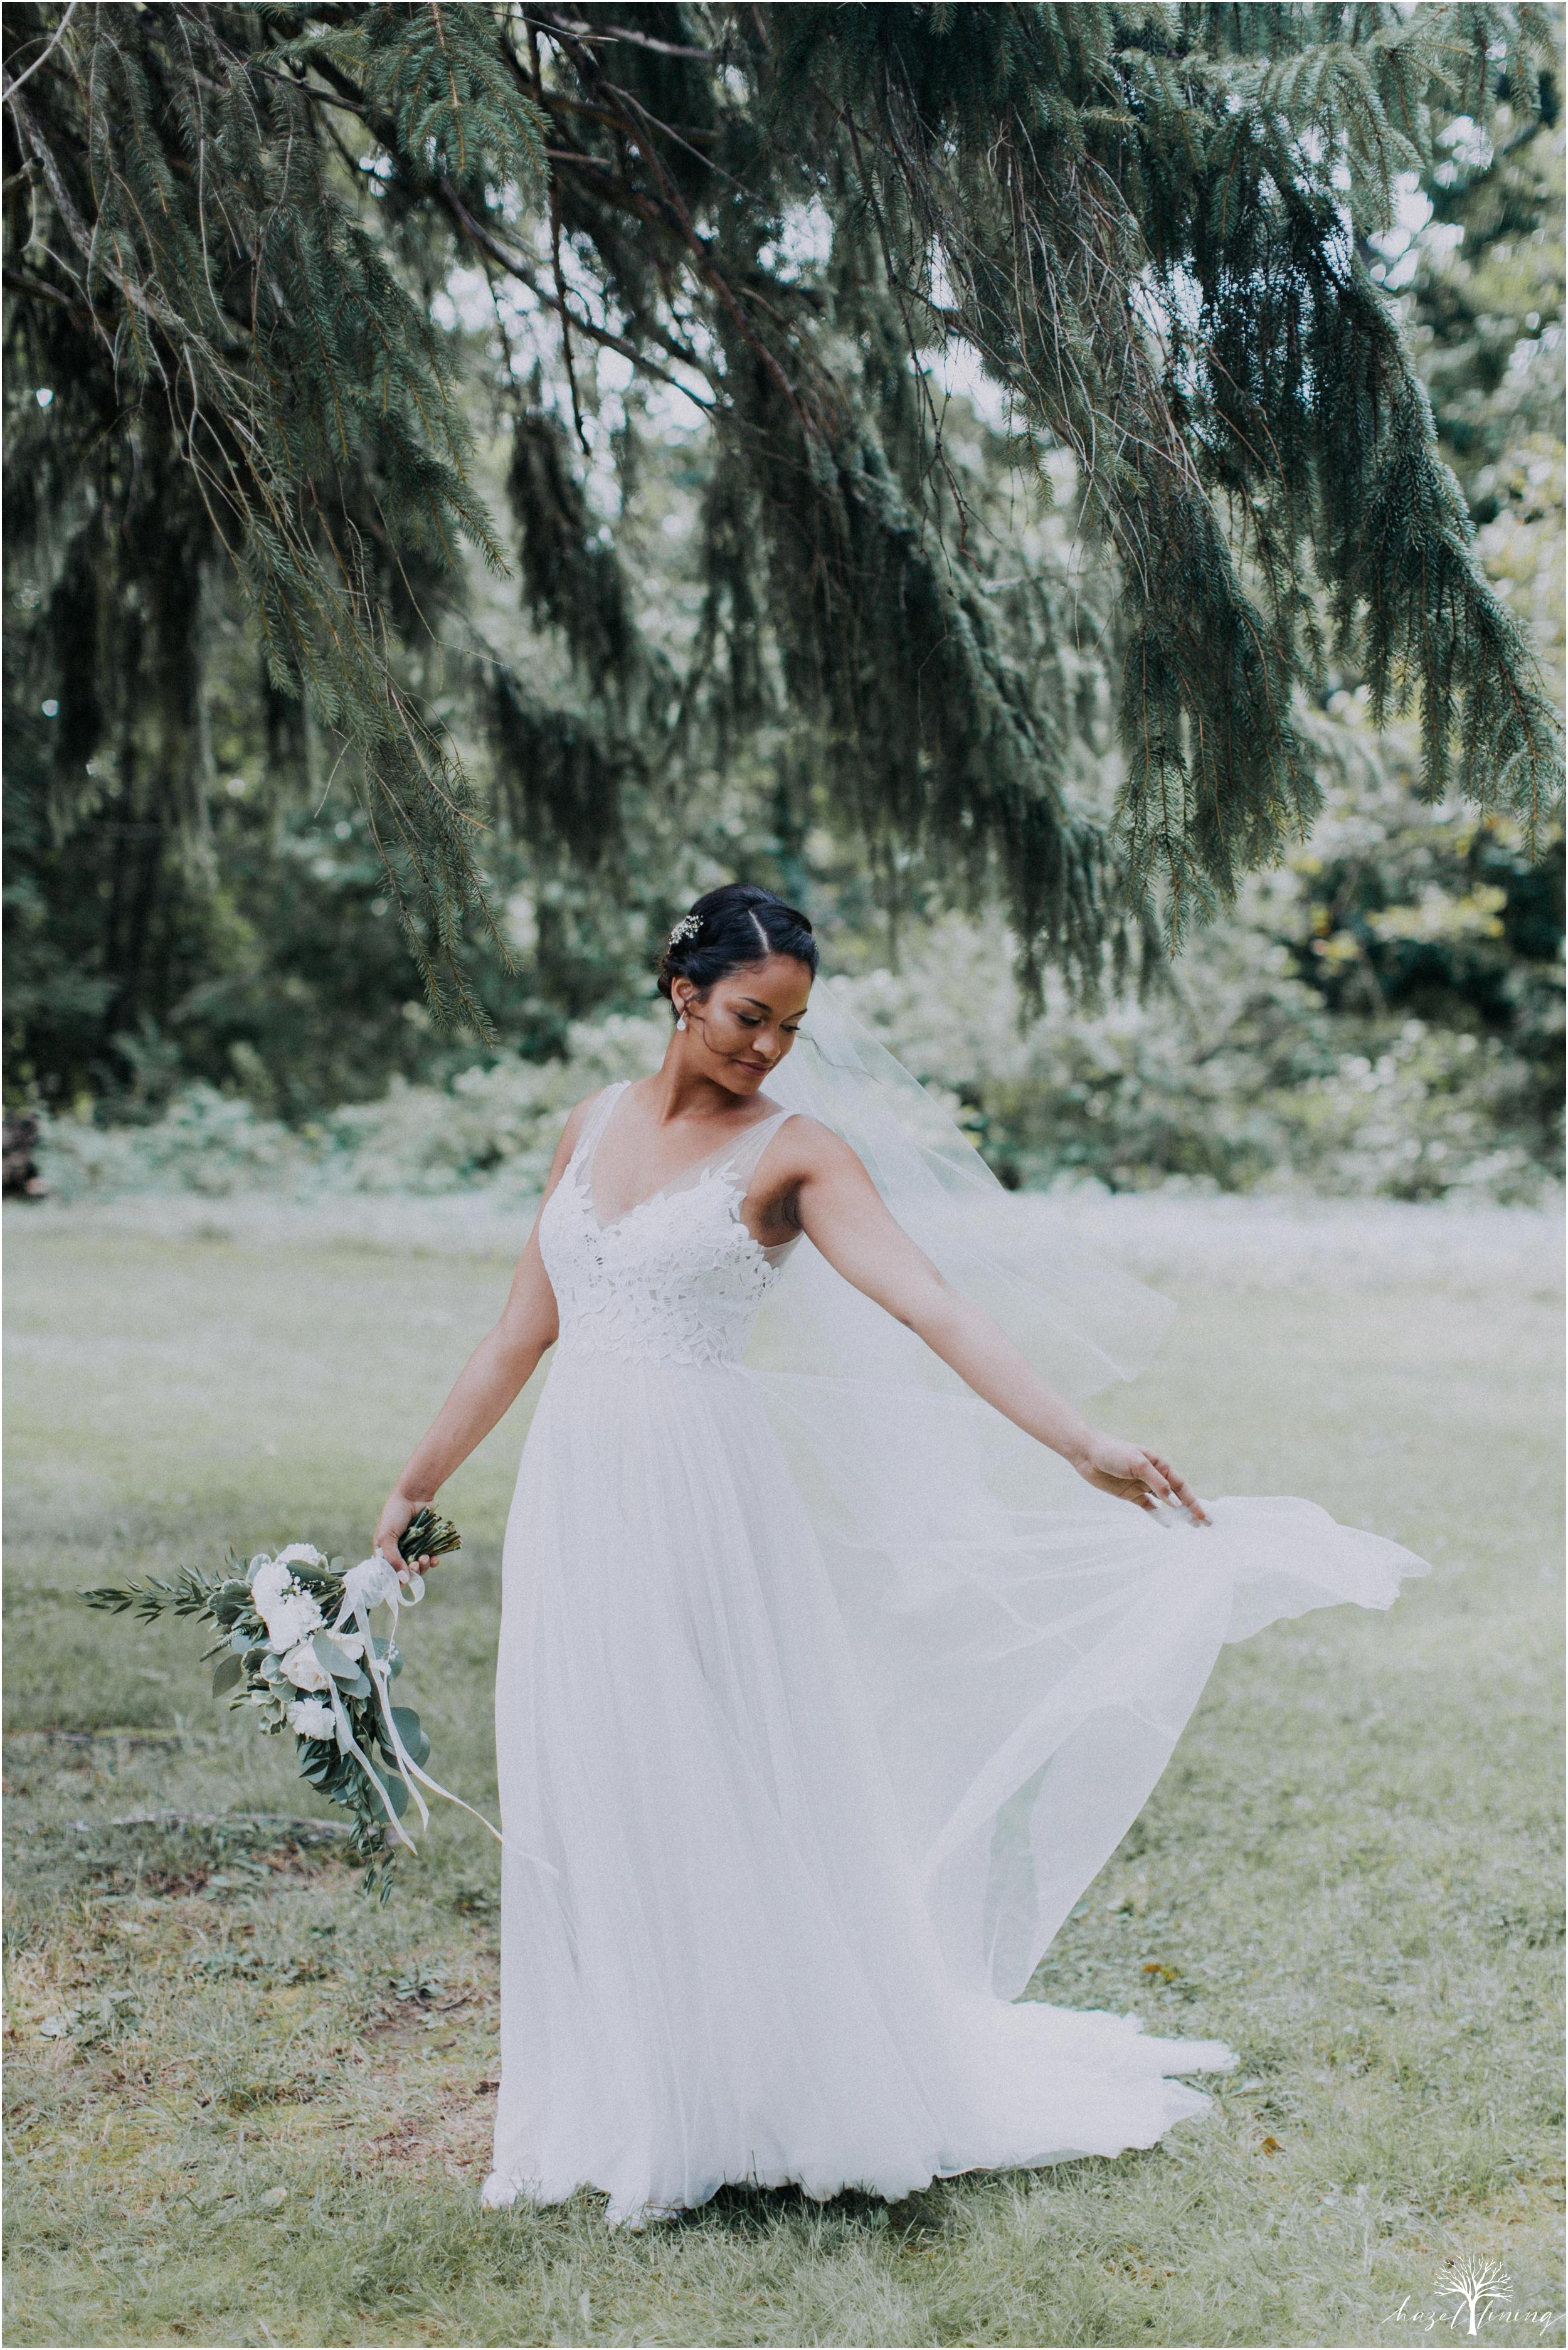 mariah-kreyling-samuel-sherratt-sherrattwiththeworld-peirce-farm-at-witch-hill-boston-massachusetts-wedding-photography-hazel-lining-travel-wedding-elopement-photography_0049.jpg